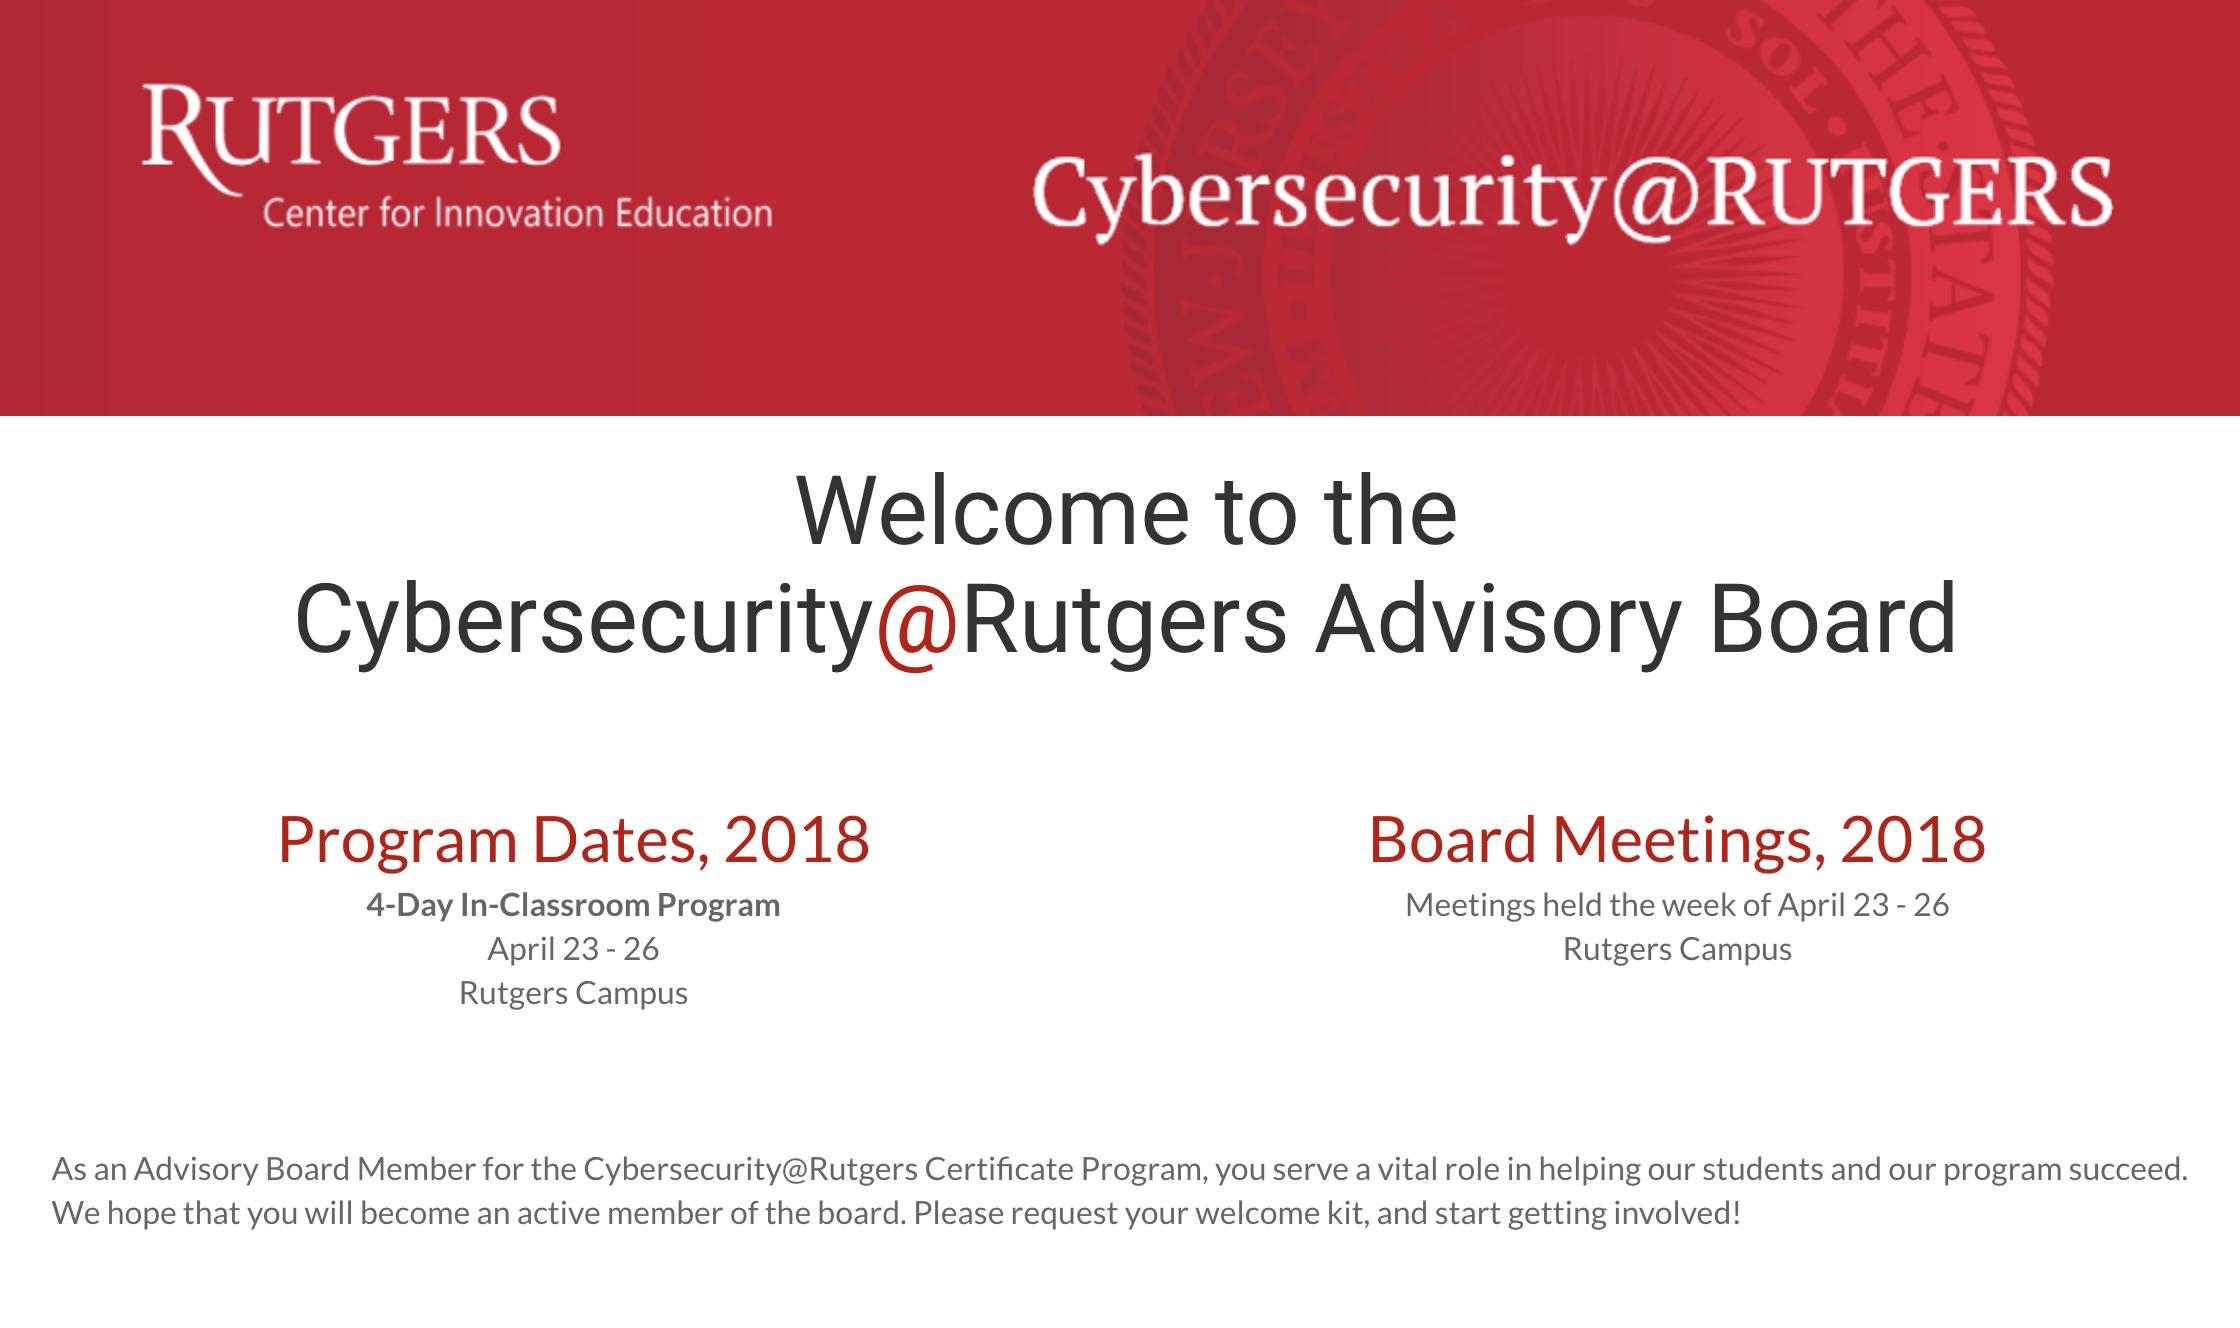 Rutgers Cybersecurity Program - Advisory Board Member